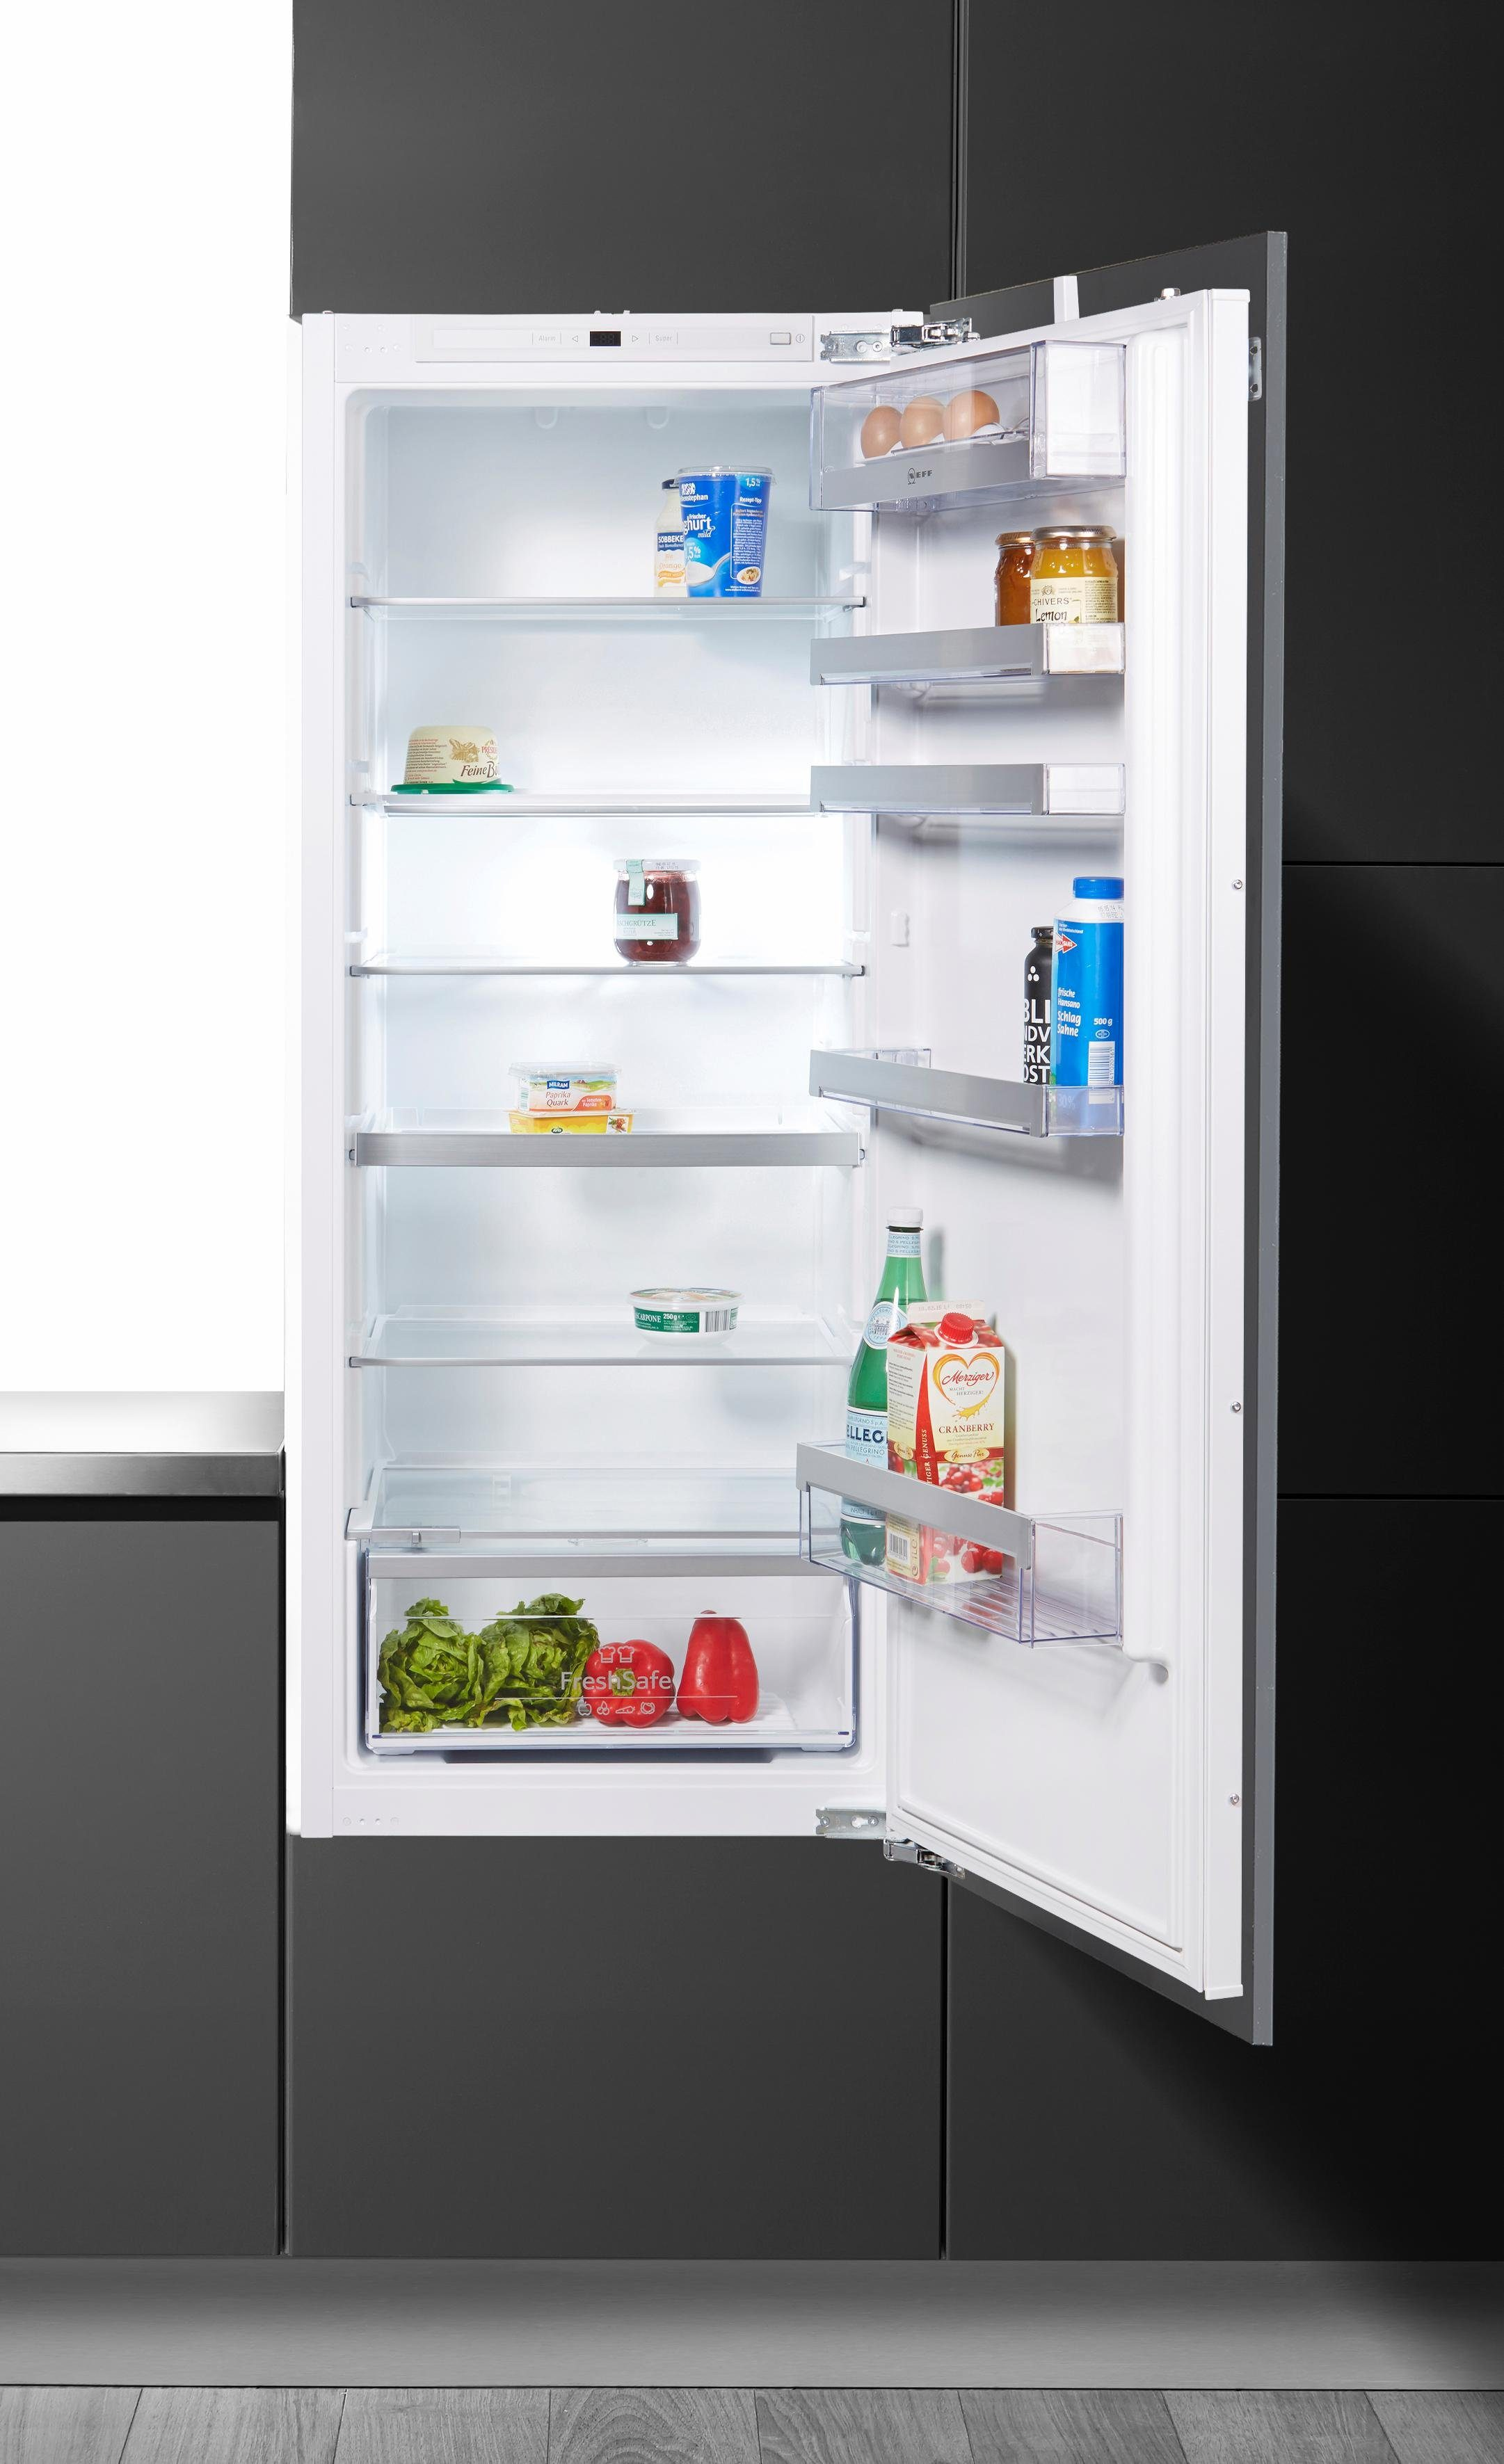 NEFF Einbaukühlschrank K535A2 / KI1513F30, 139,7 cm hoch, 55,8 cm breit, integrierbar